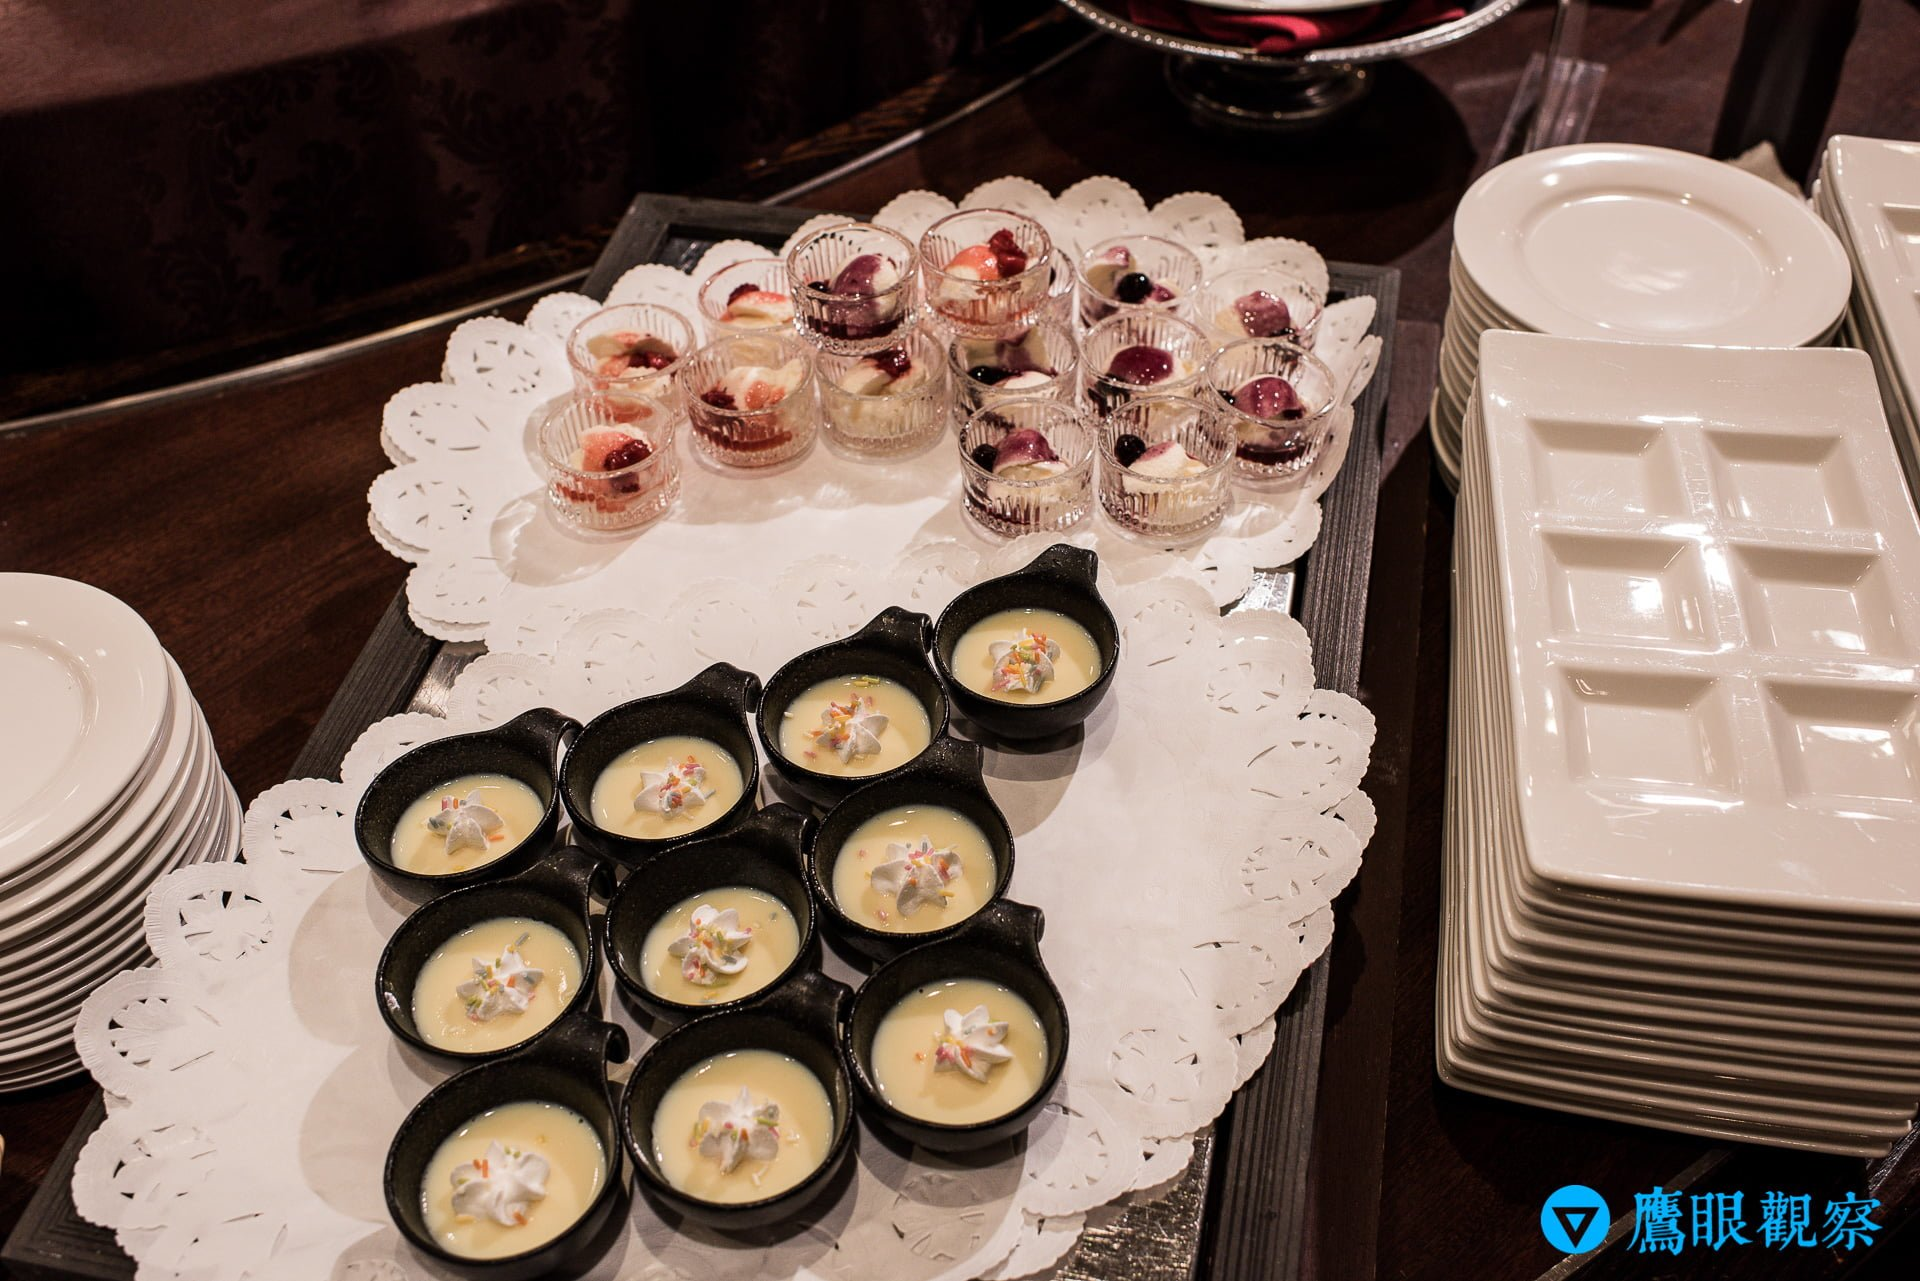 Travel Oarai Hotel in Ibaraki Prefecture Japan 26 日本茨城縣/東茨城/大洗飯店(大洗ホテル)/旅館推薦與住宿旅遊心得分享